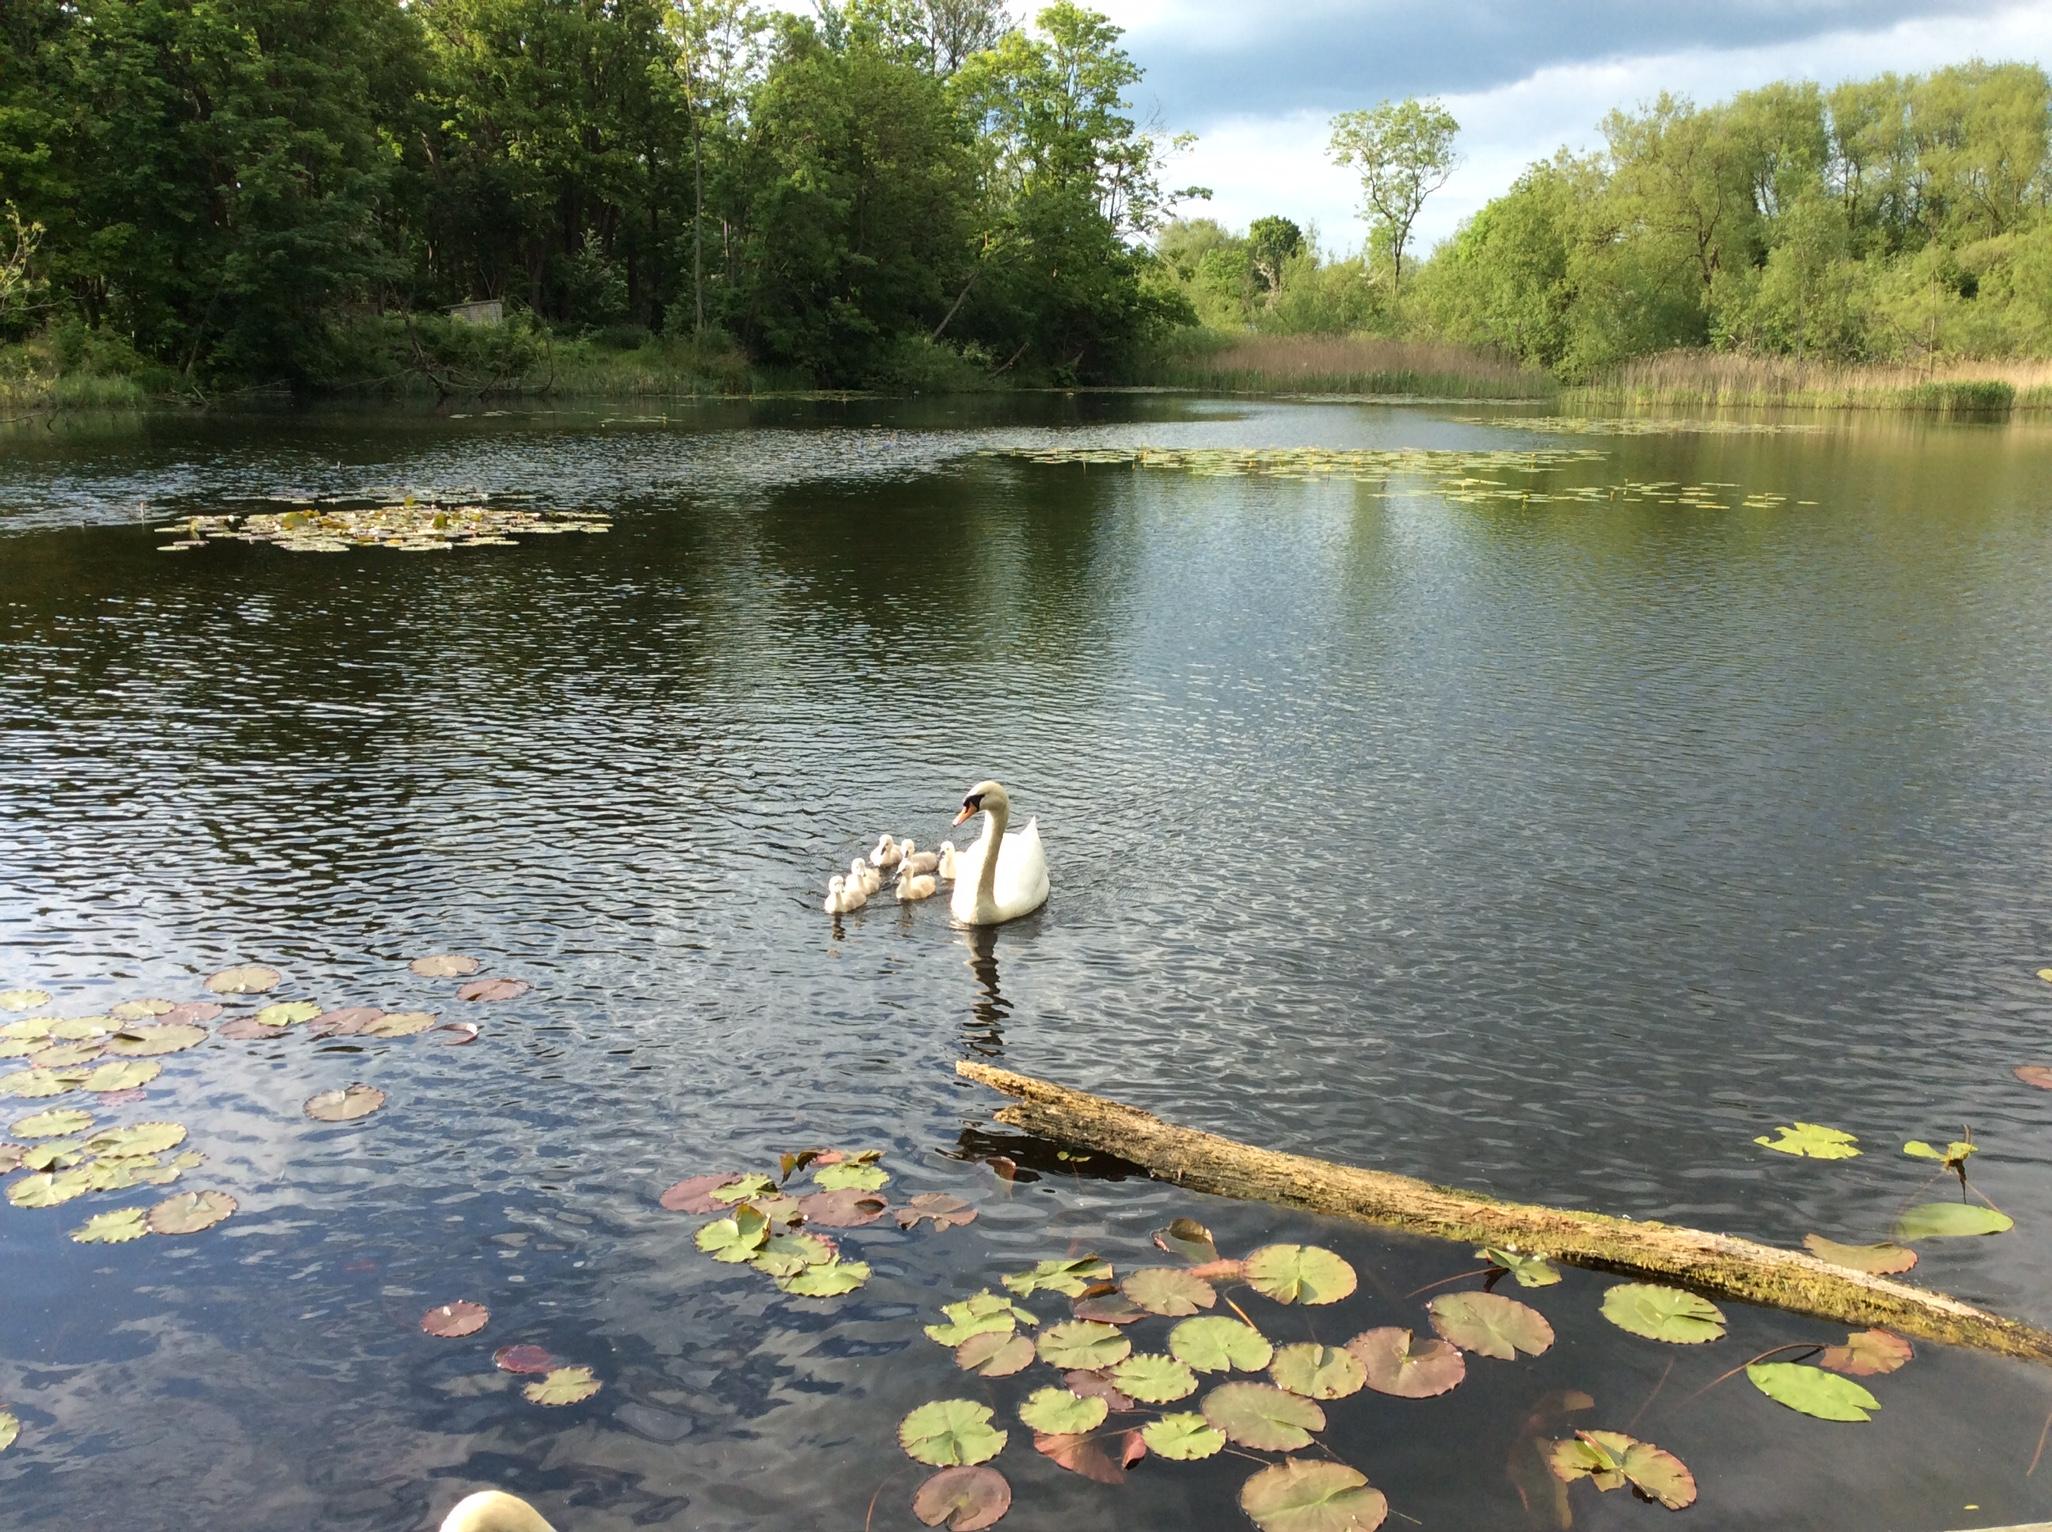 Swans spring 2016 copy.JPG